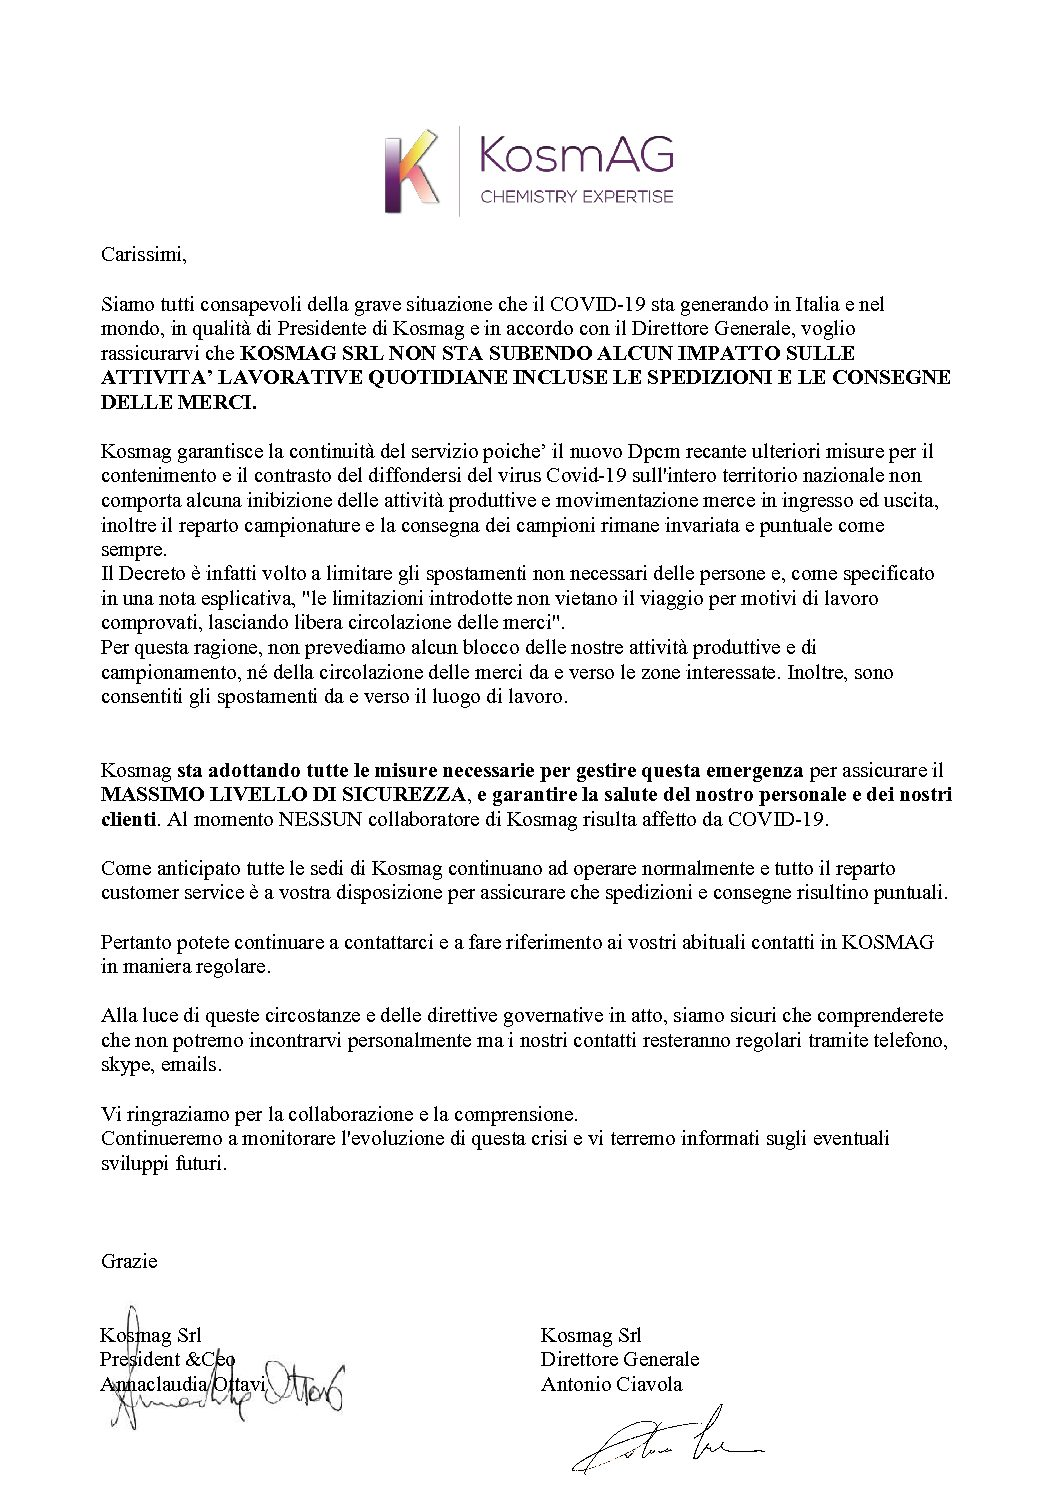 KosmAG Lettera Ufficiale